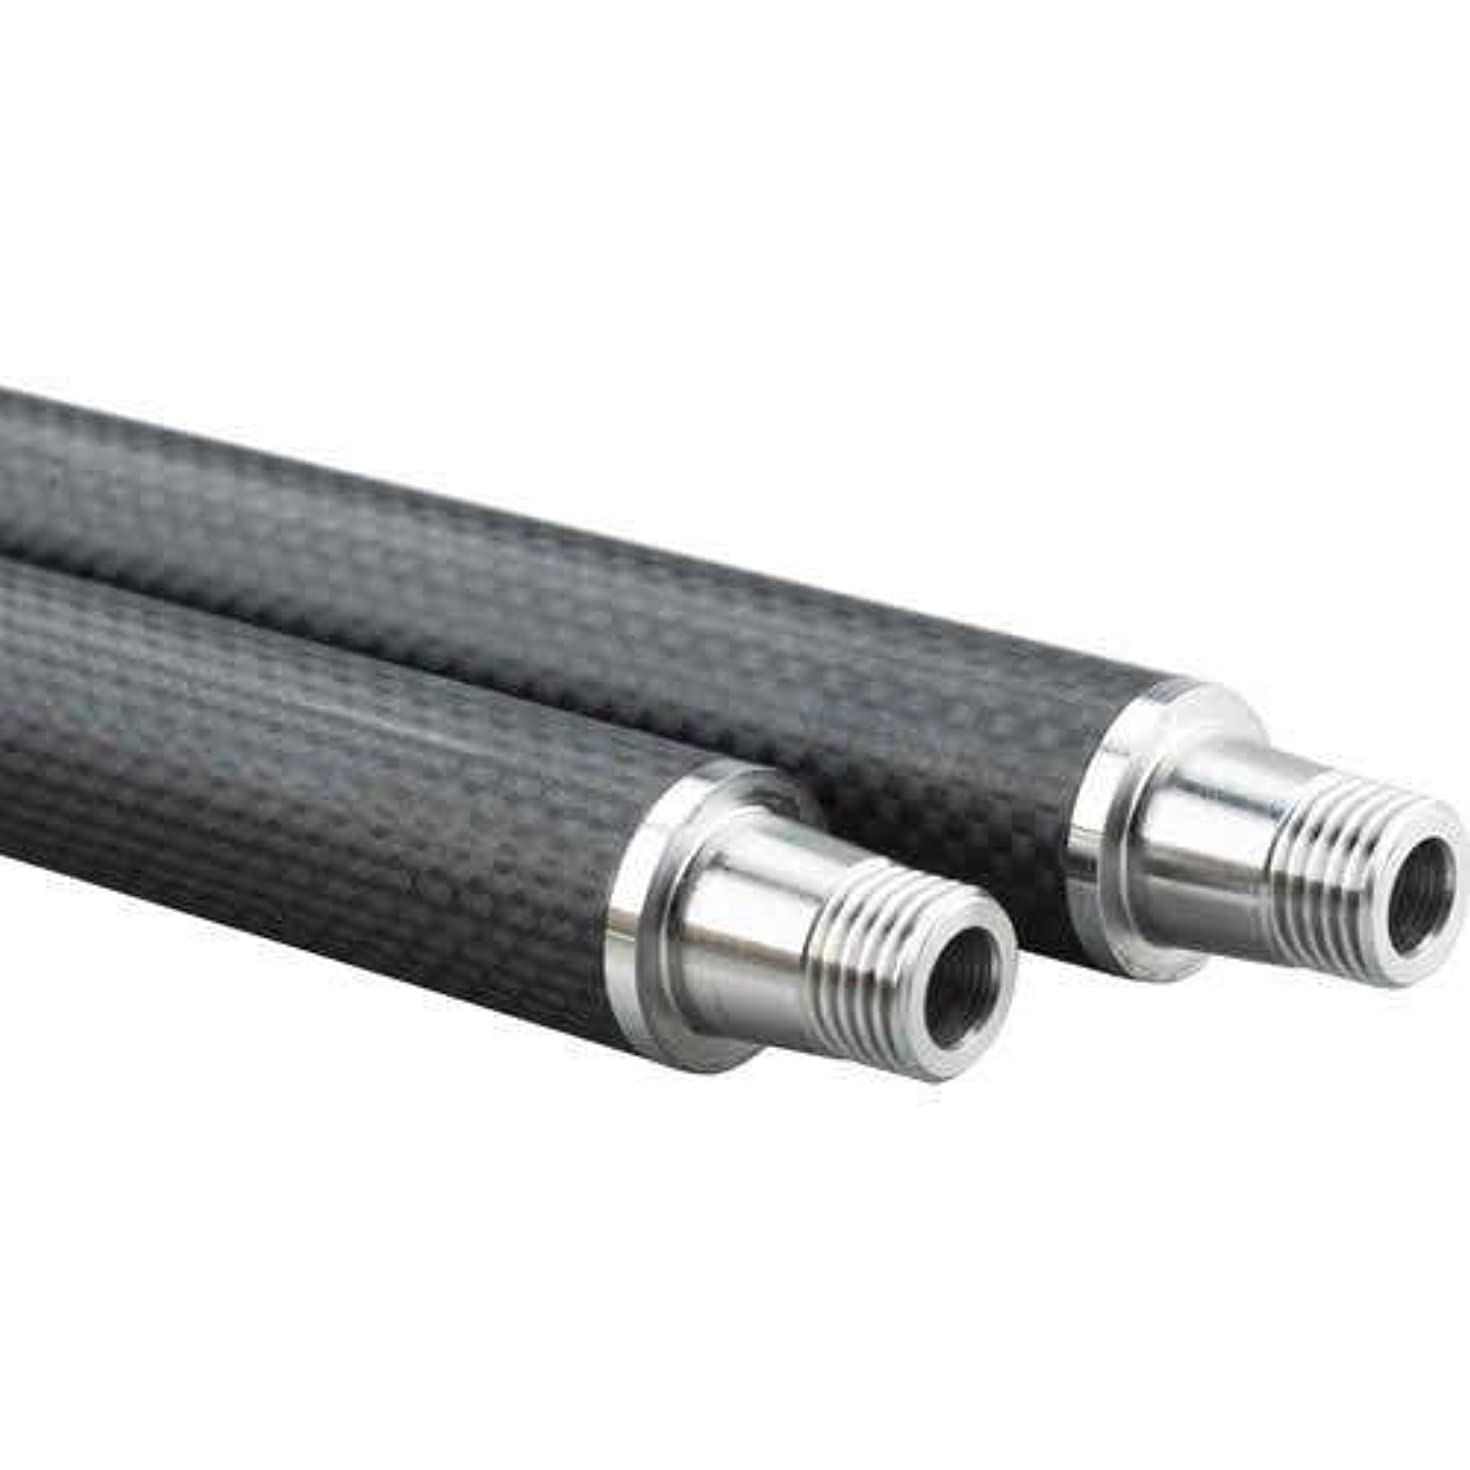 IFOOTAGE 6' Smooth & Light Carbon Fiber Extension Tube for S1 Shark Slider, 2-Pack